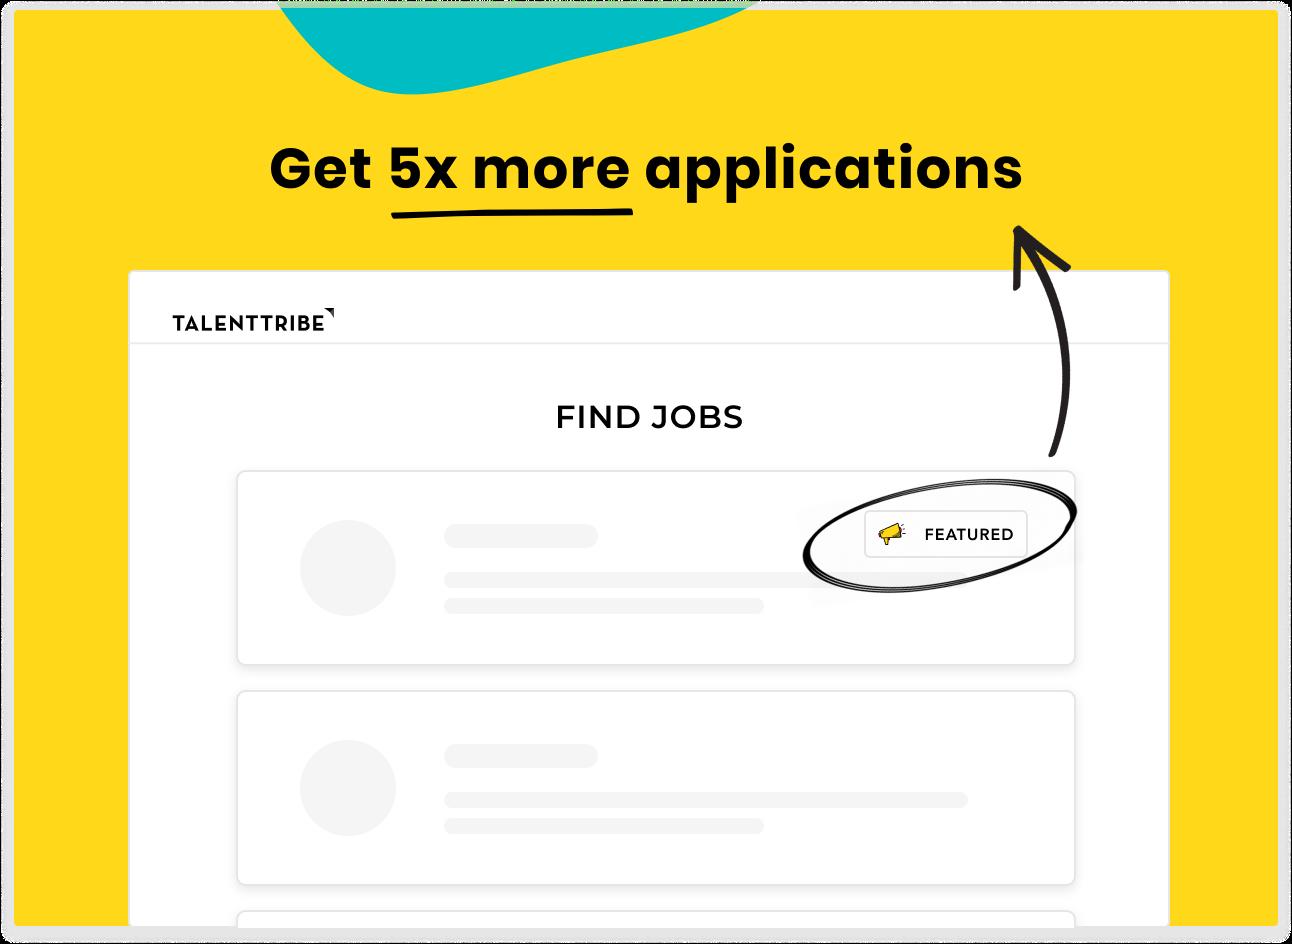 Sponsored job - get 5x more applications